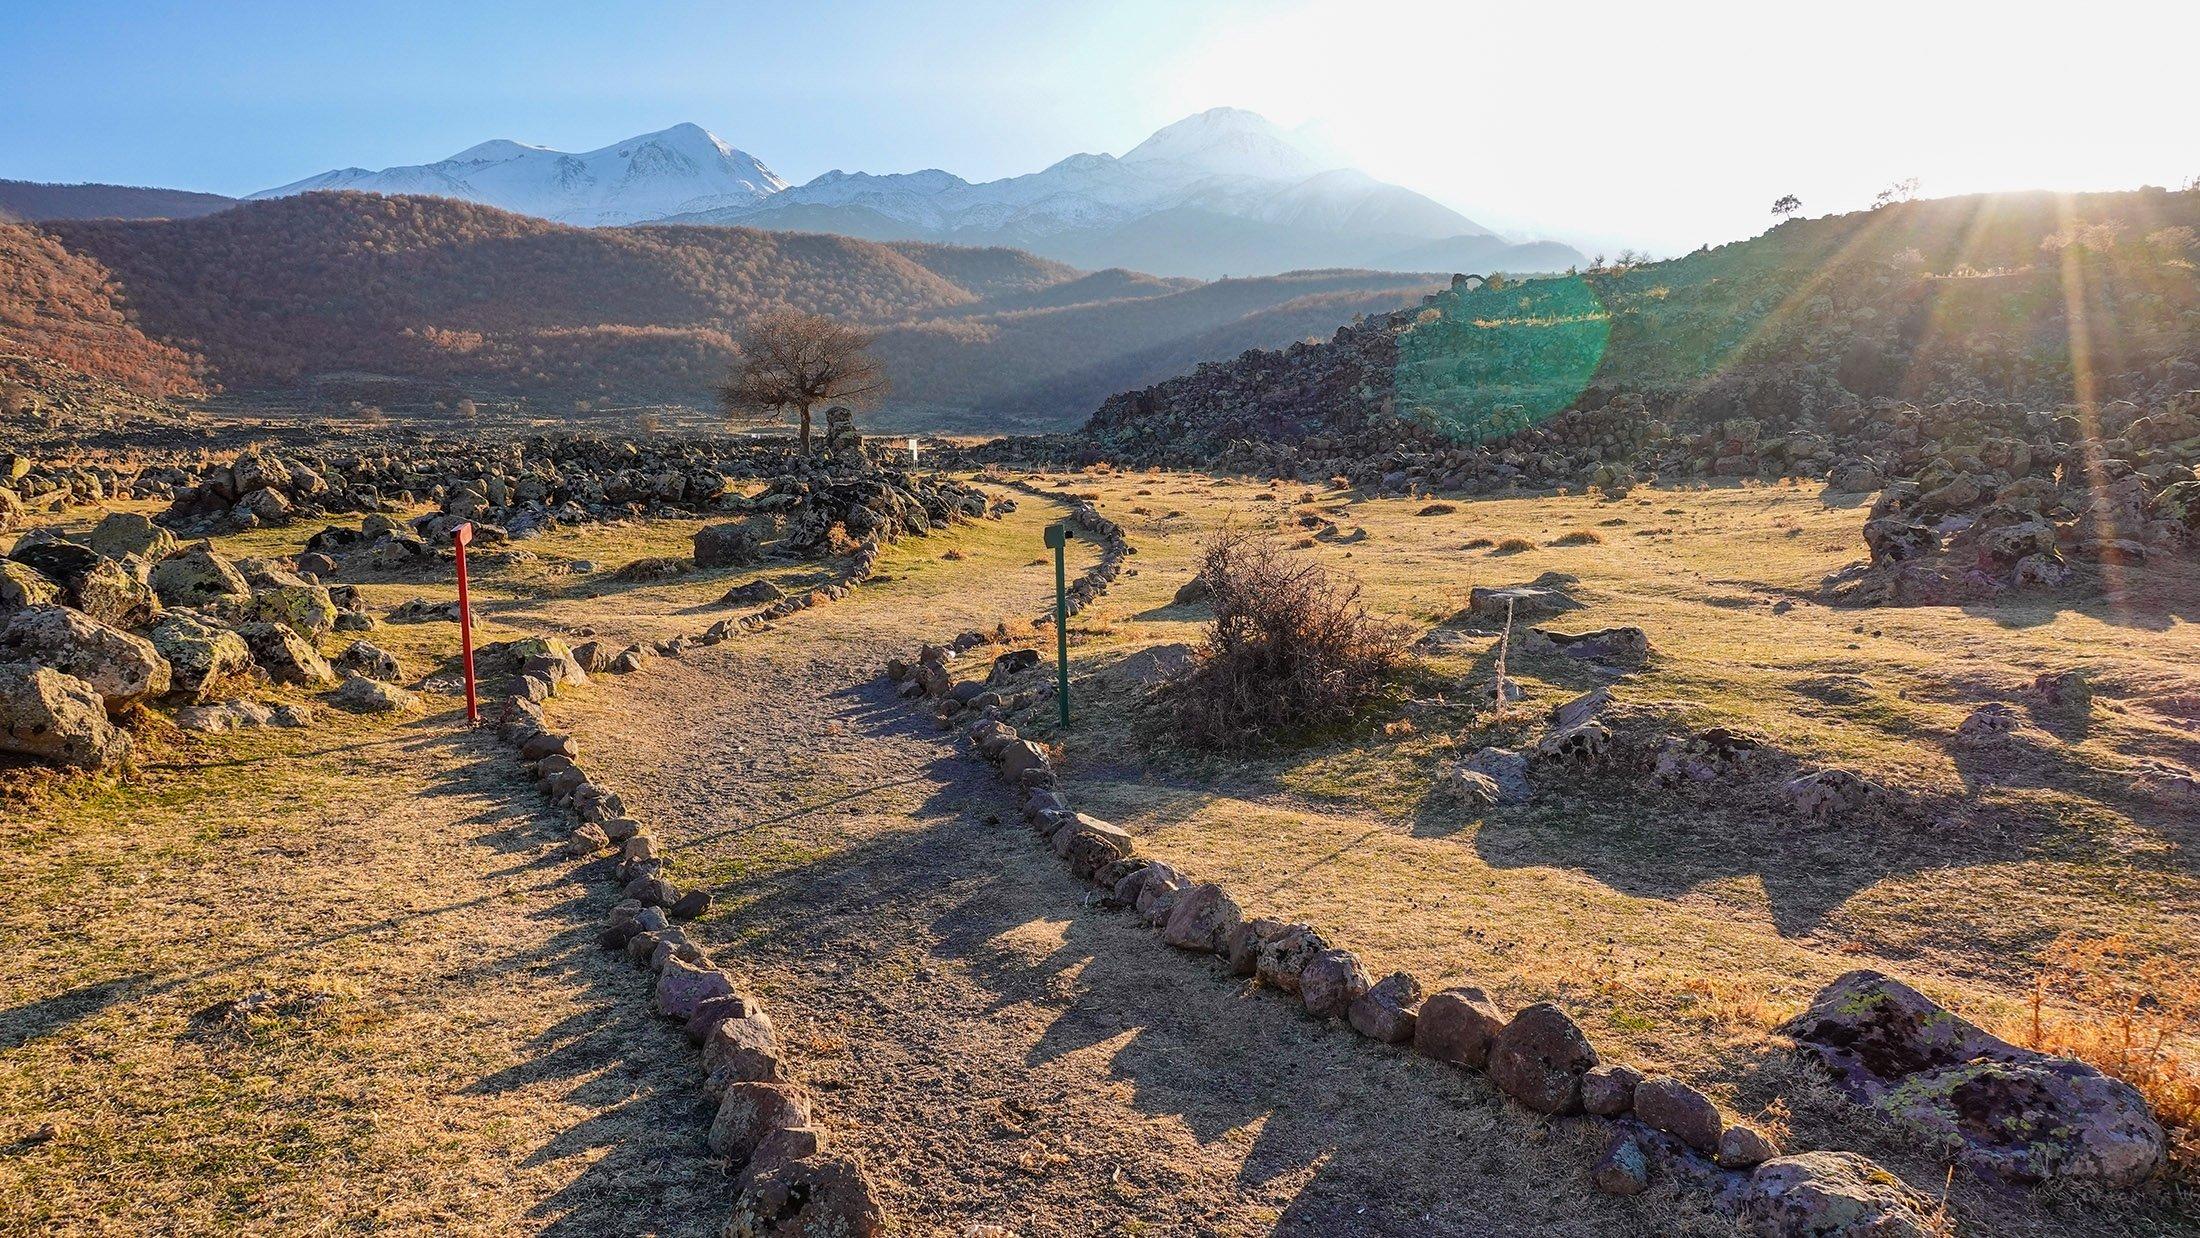 The walking path at Mokissos. (Photo by Argun Konuk)